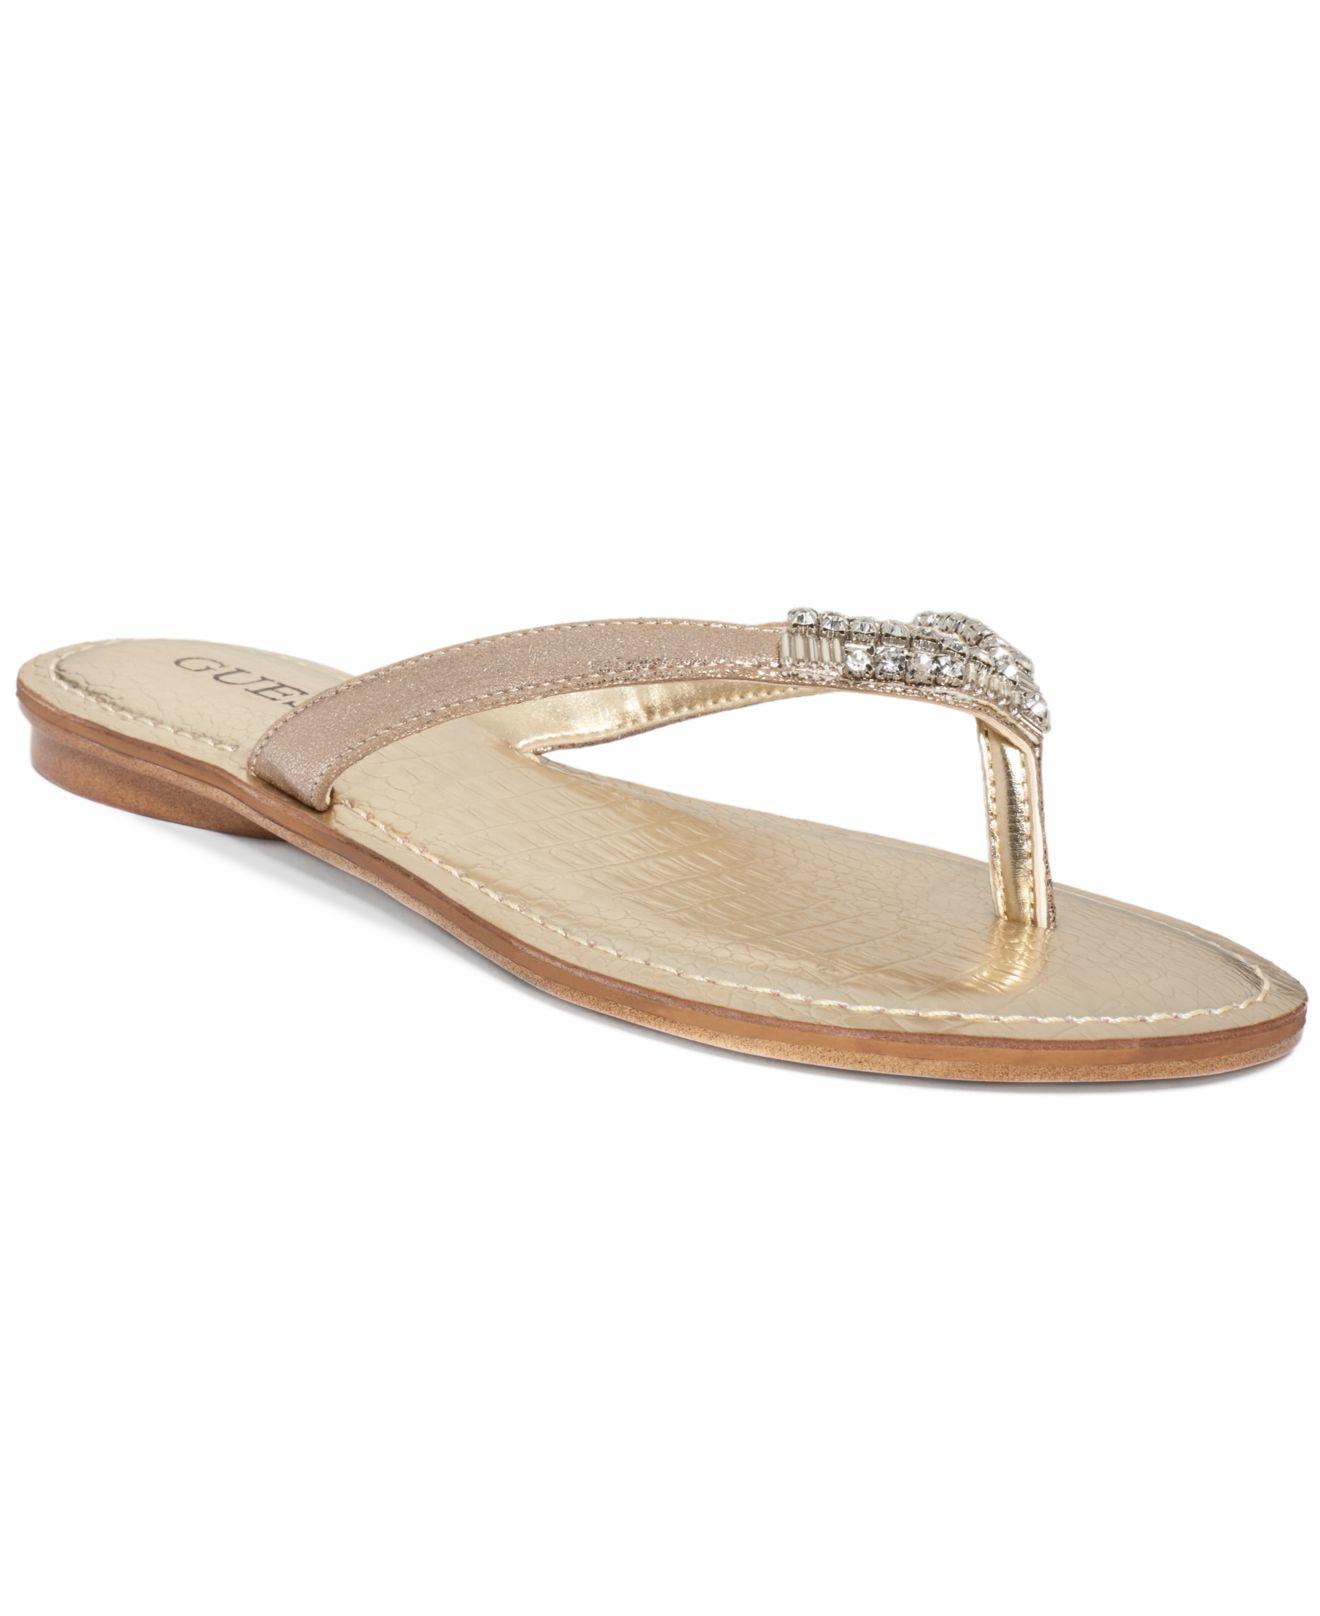 Lyst Guess Women S Griffa Flip Flop Sandals In Metallic